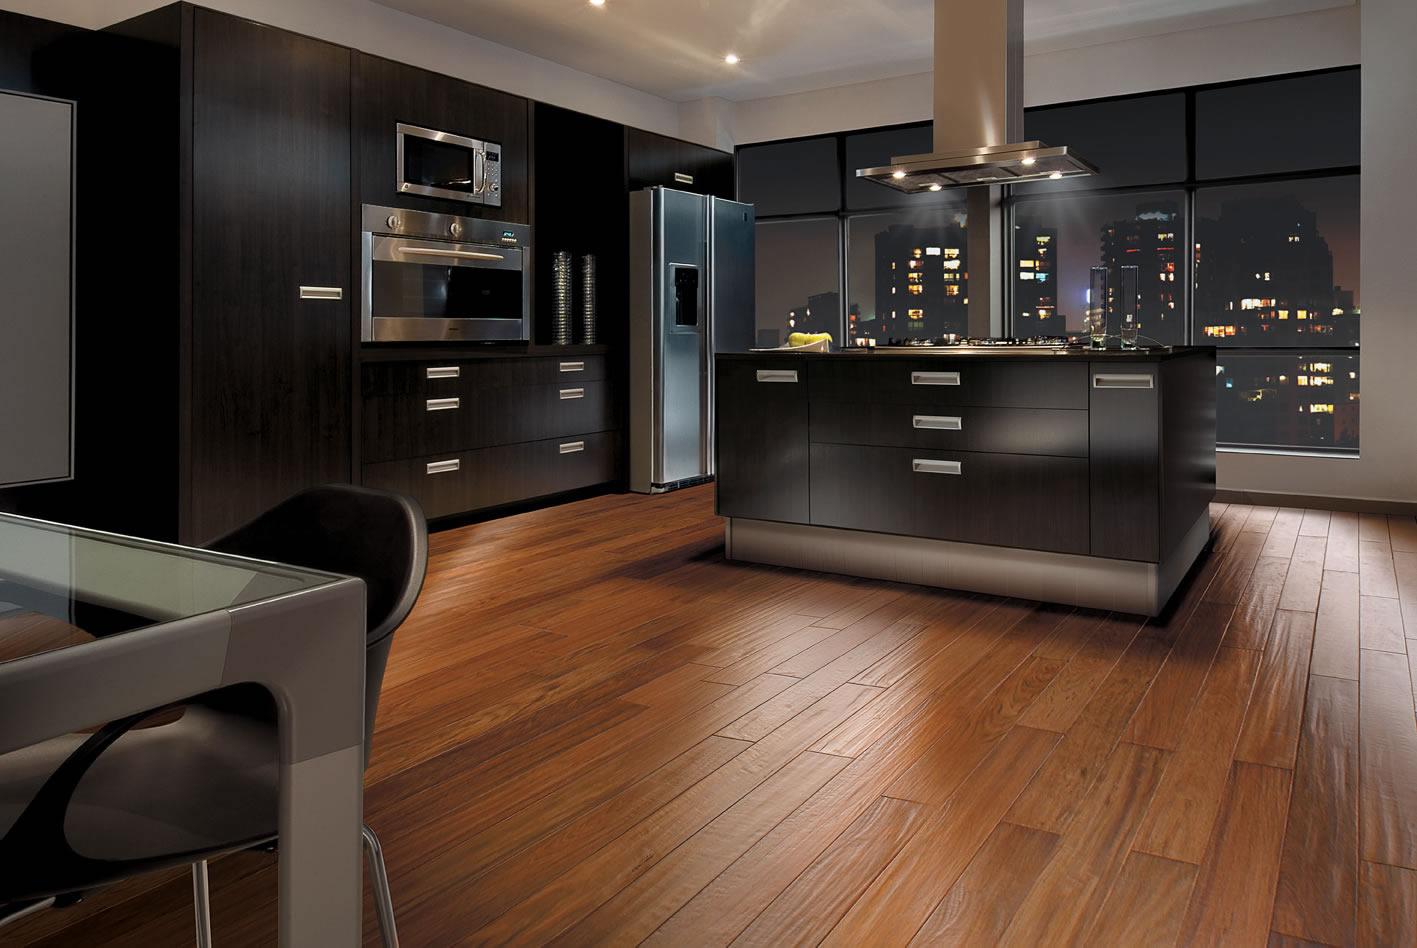 Pisos laminados durafloor pre os e fotos decorando casas for Parquet laminado para banos y cocinas